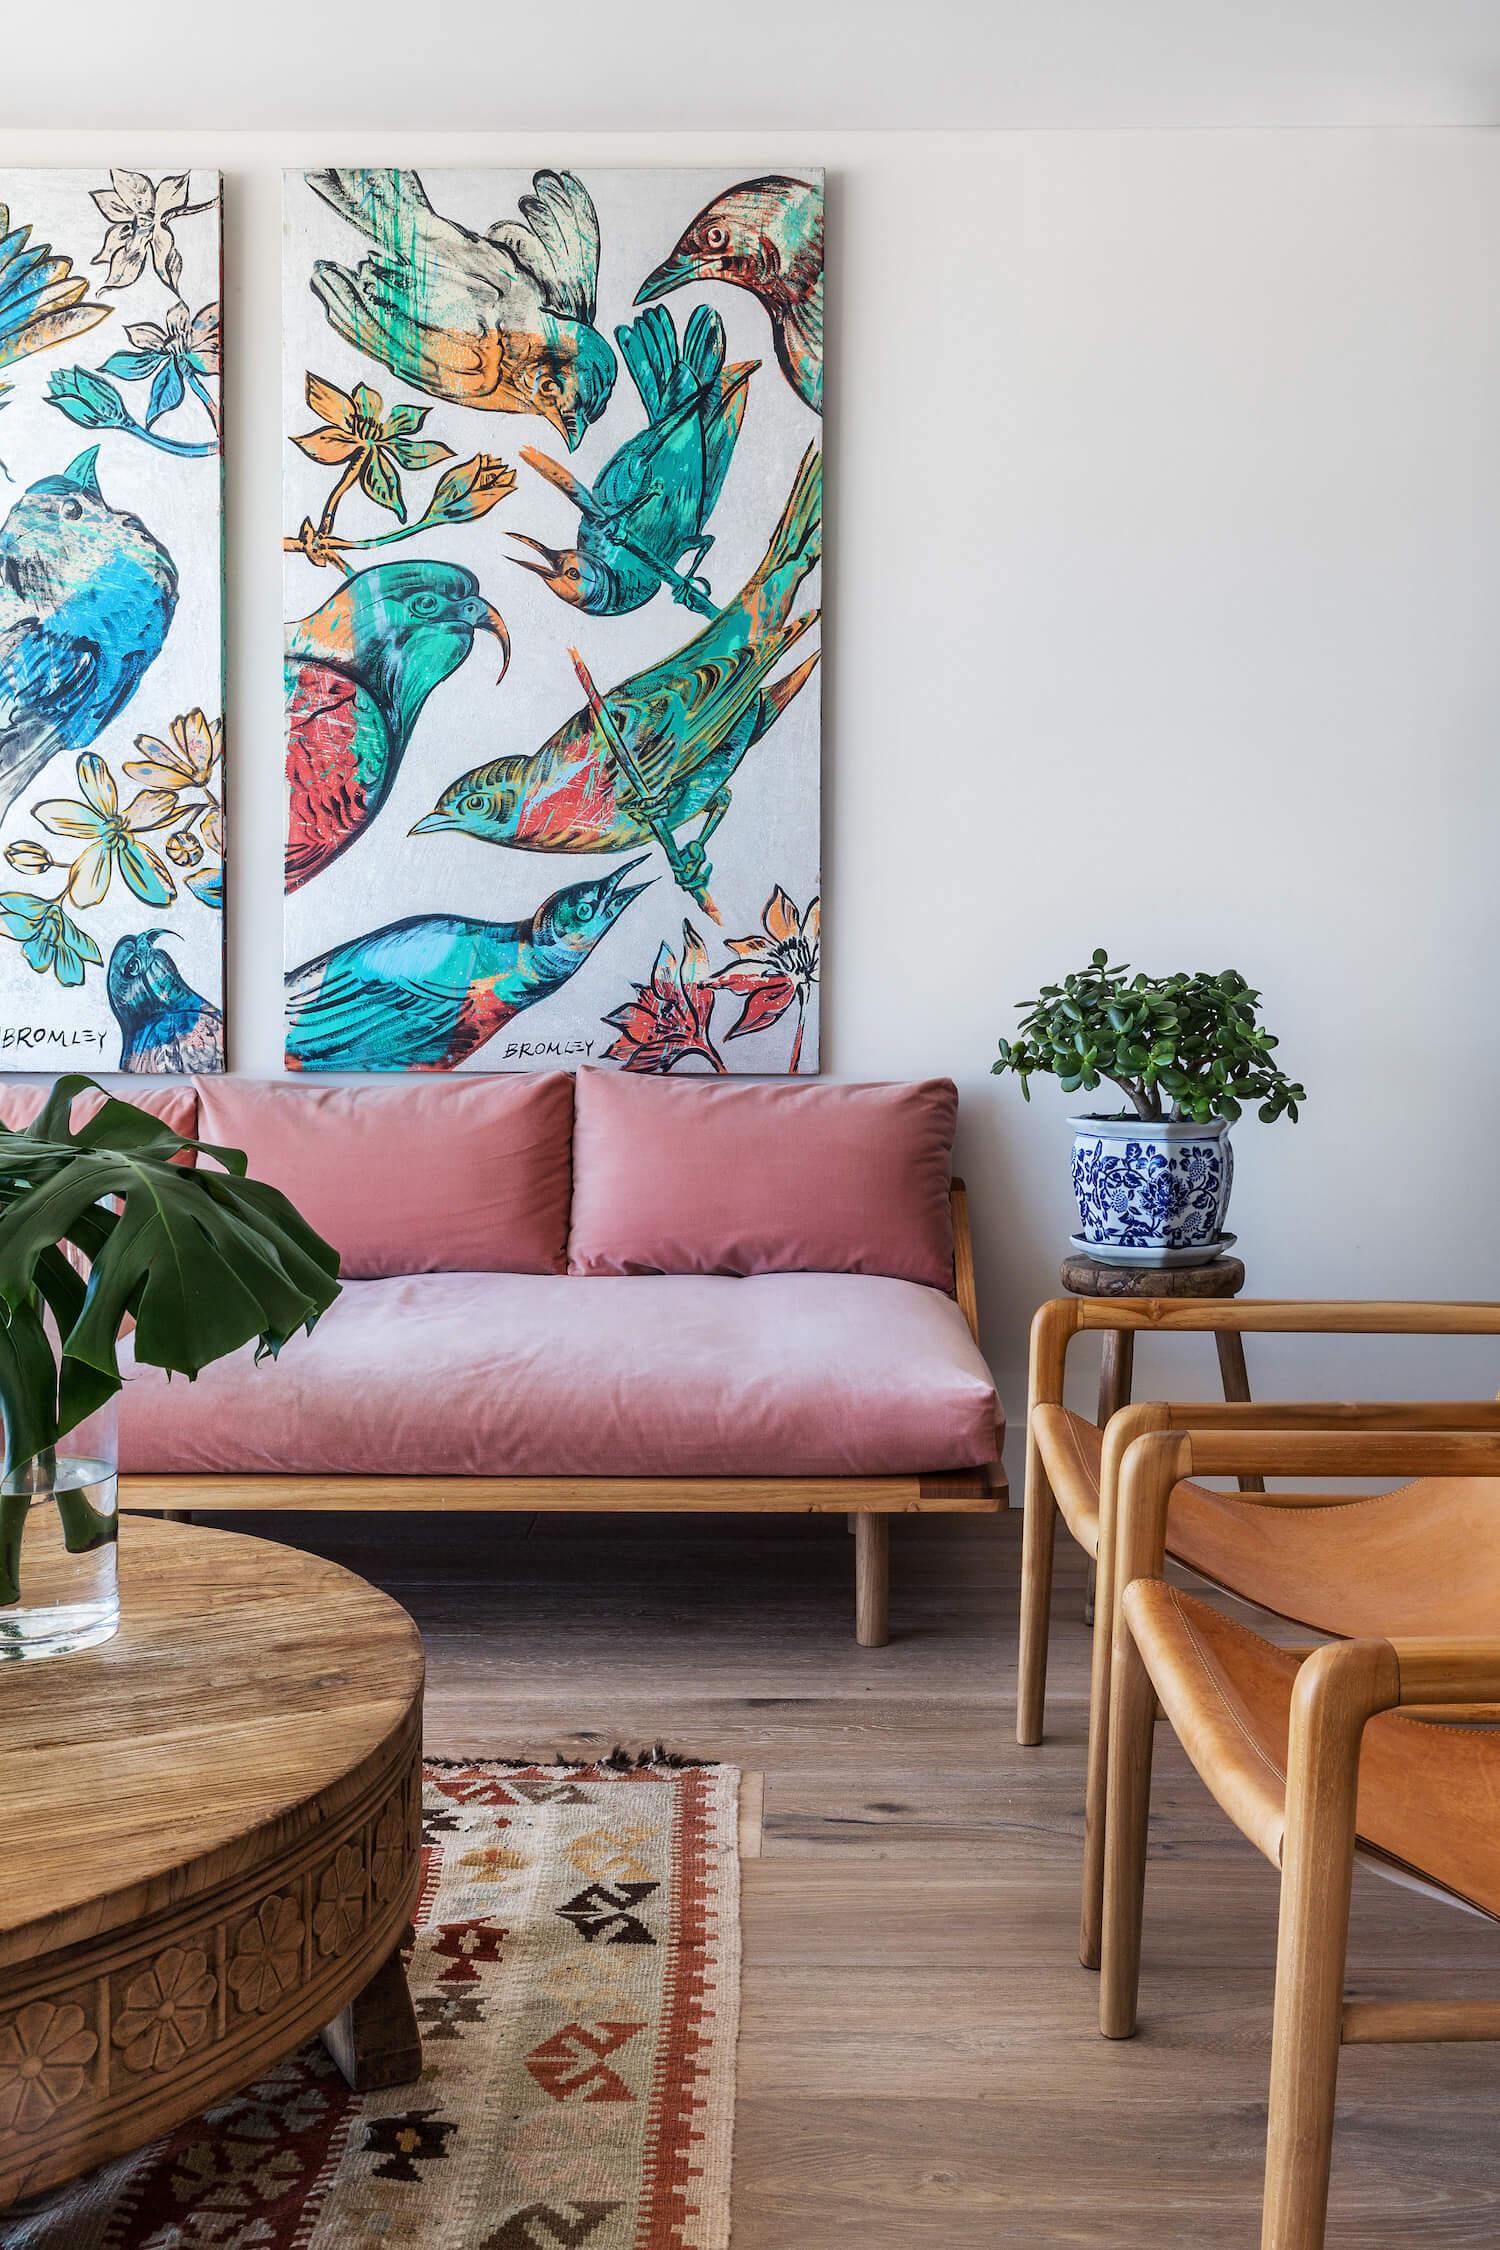 est living designer interview alexander and co brighton boulevard 2